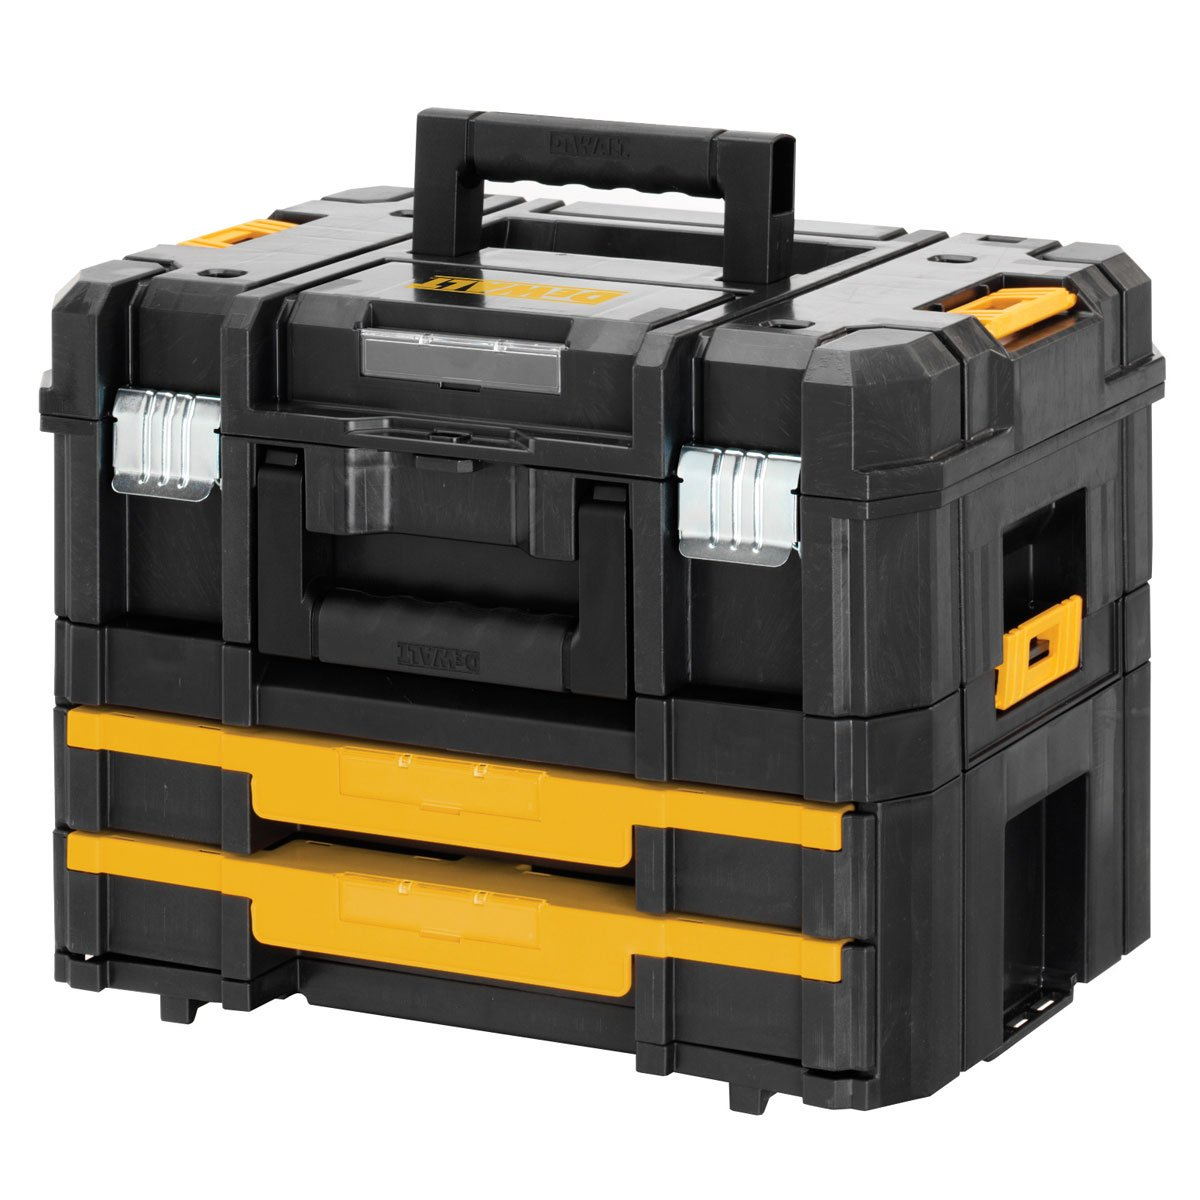 DeWalt DWST170702 DWST170702 Transportbox Combo TSTAK Box II & TSTAK Box IV  BaumarktBewertungen